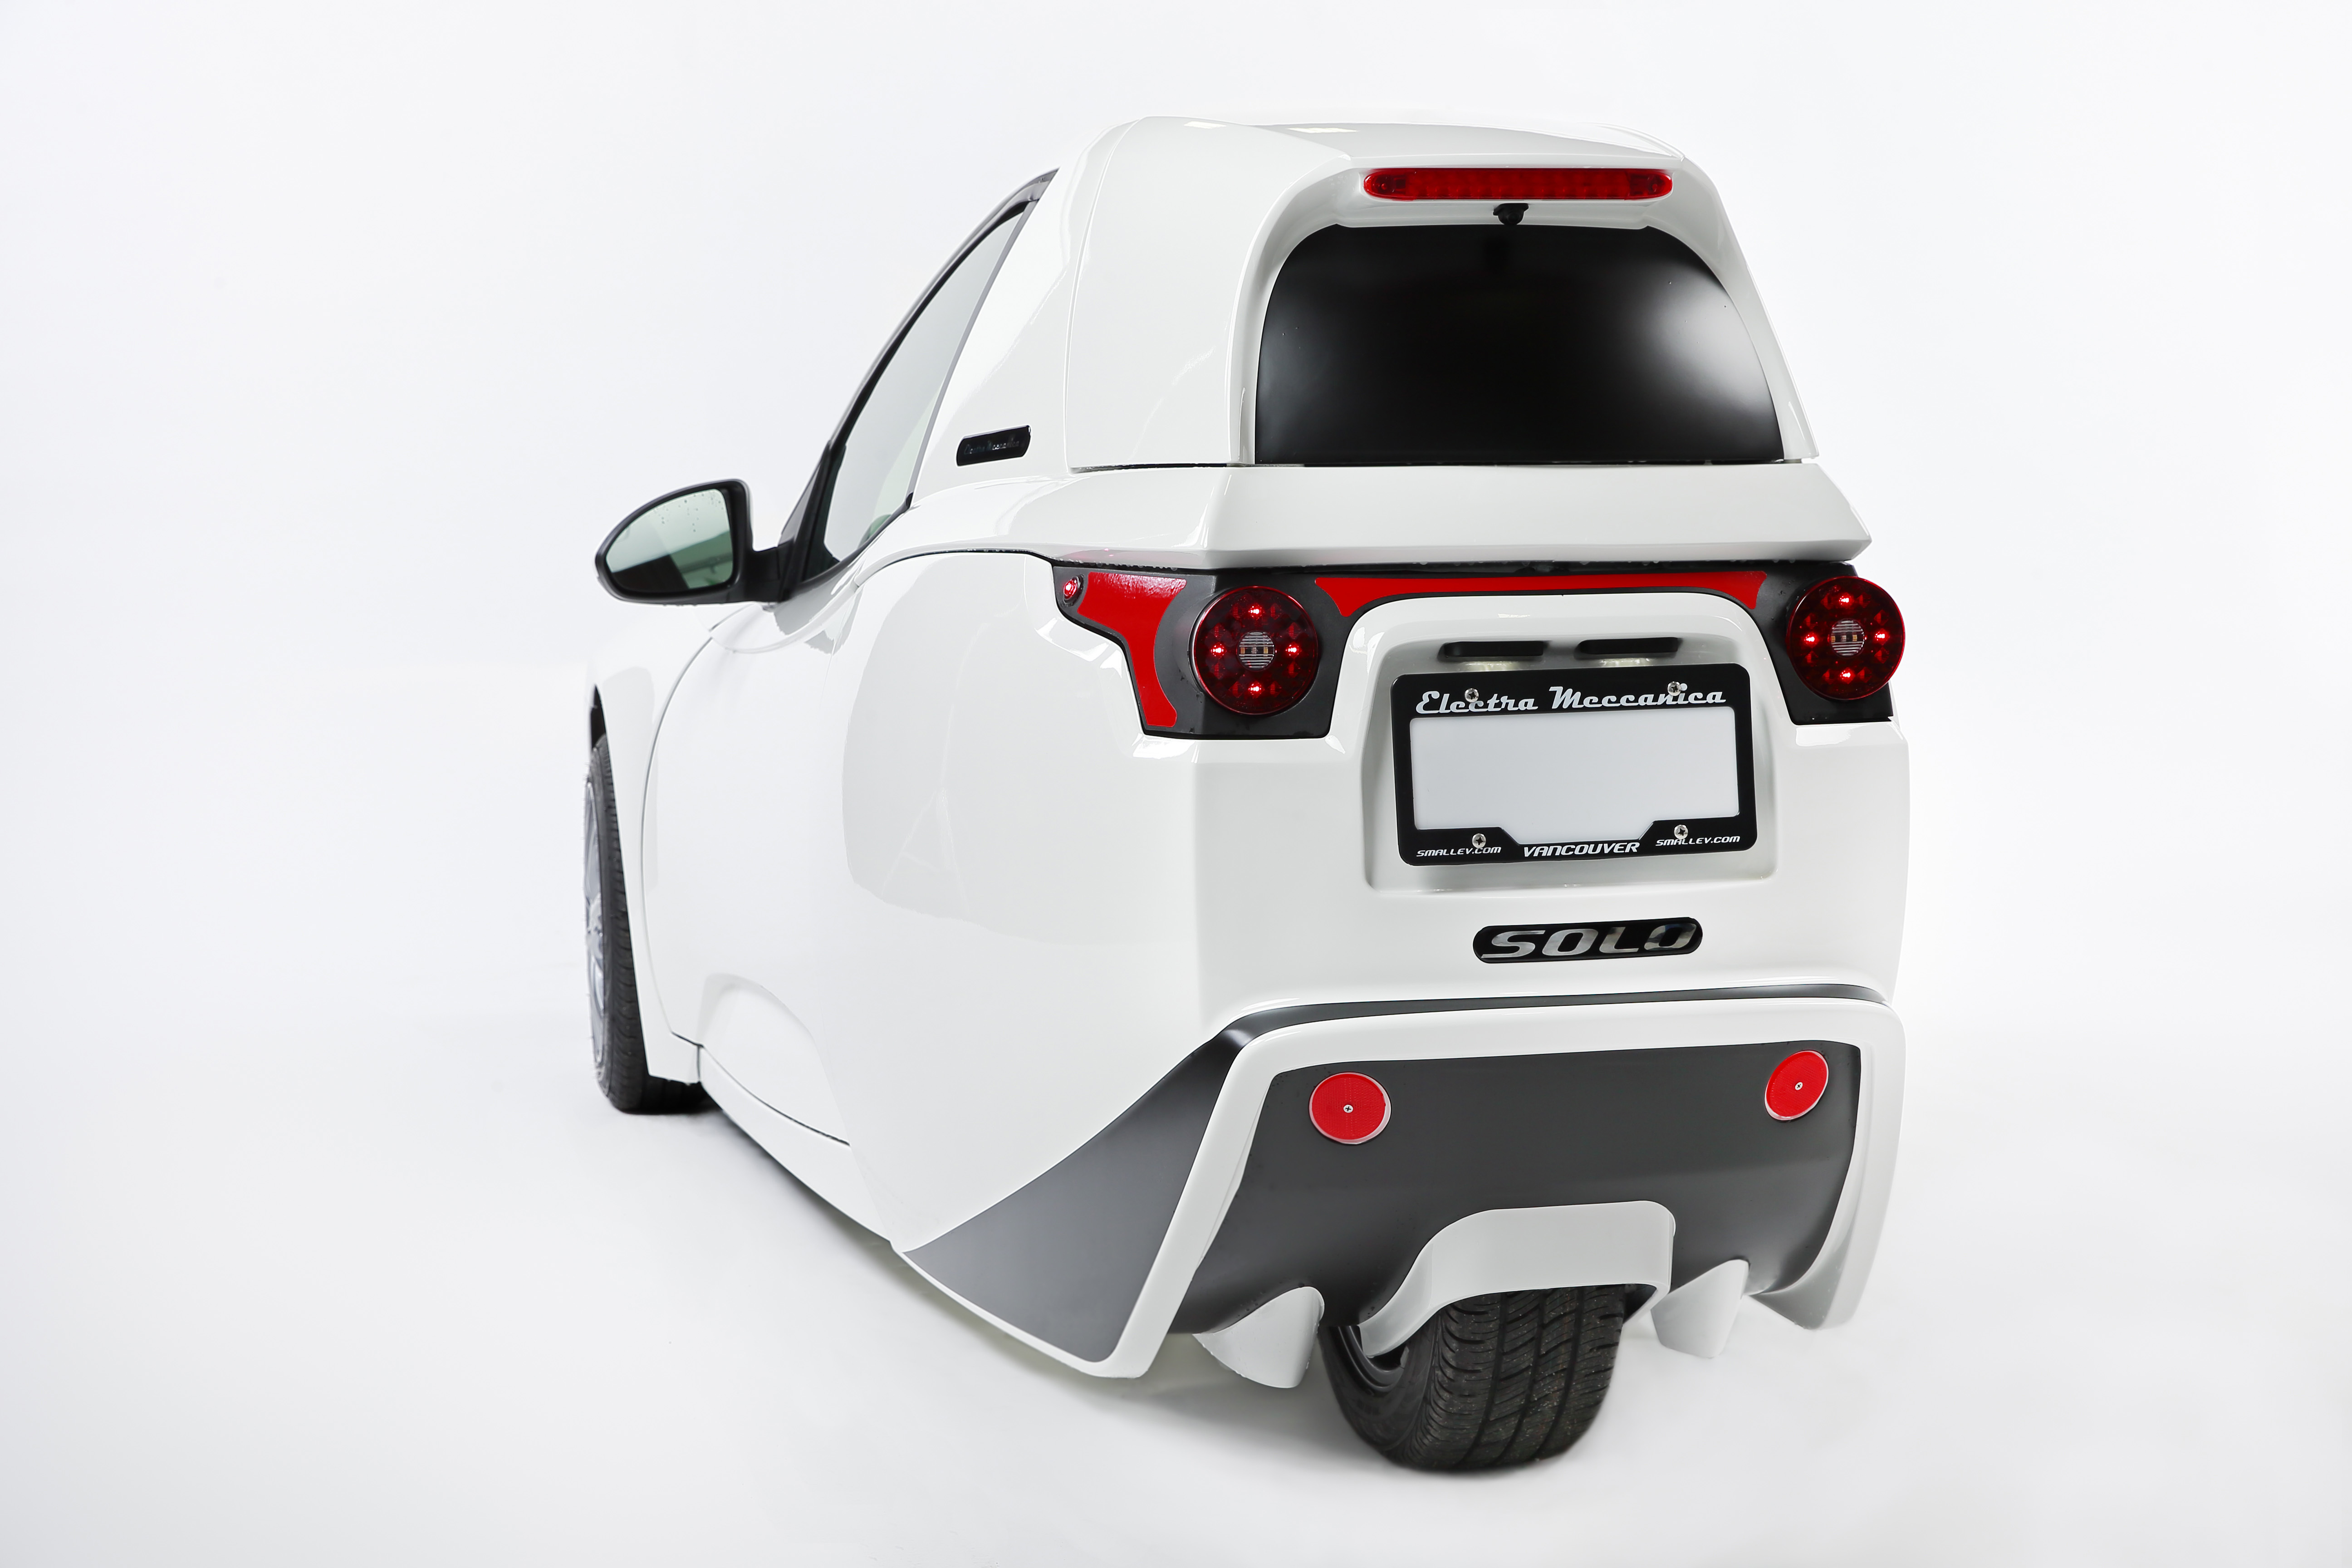 Detroit 3 Wheeled Electric Vehicle Set To Go On Sale